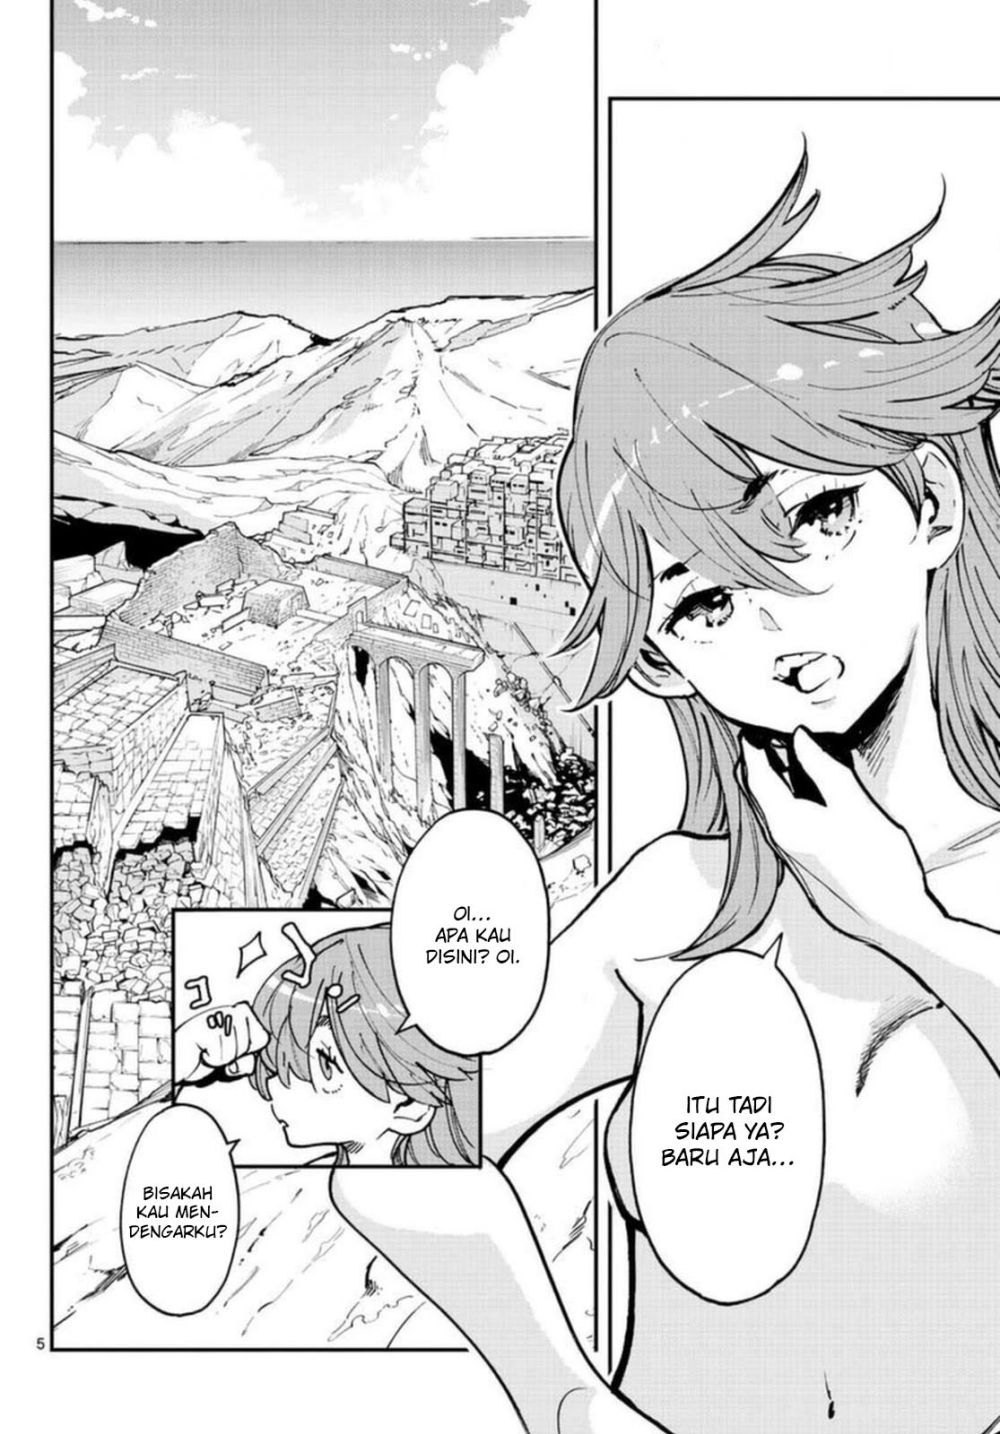 Ninkyou Tensei: Isekai no Yakuzahime: Chapter 24.1 - Page 6